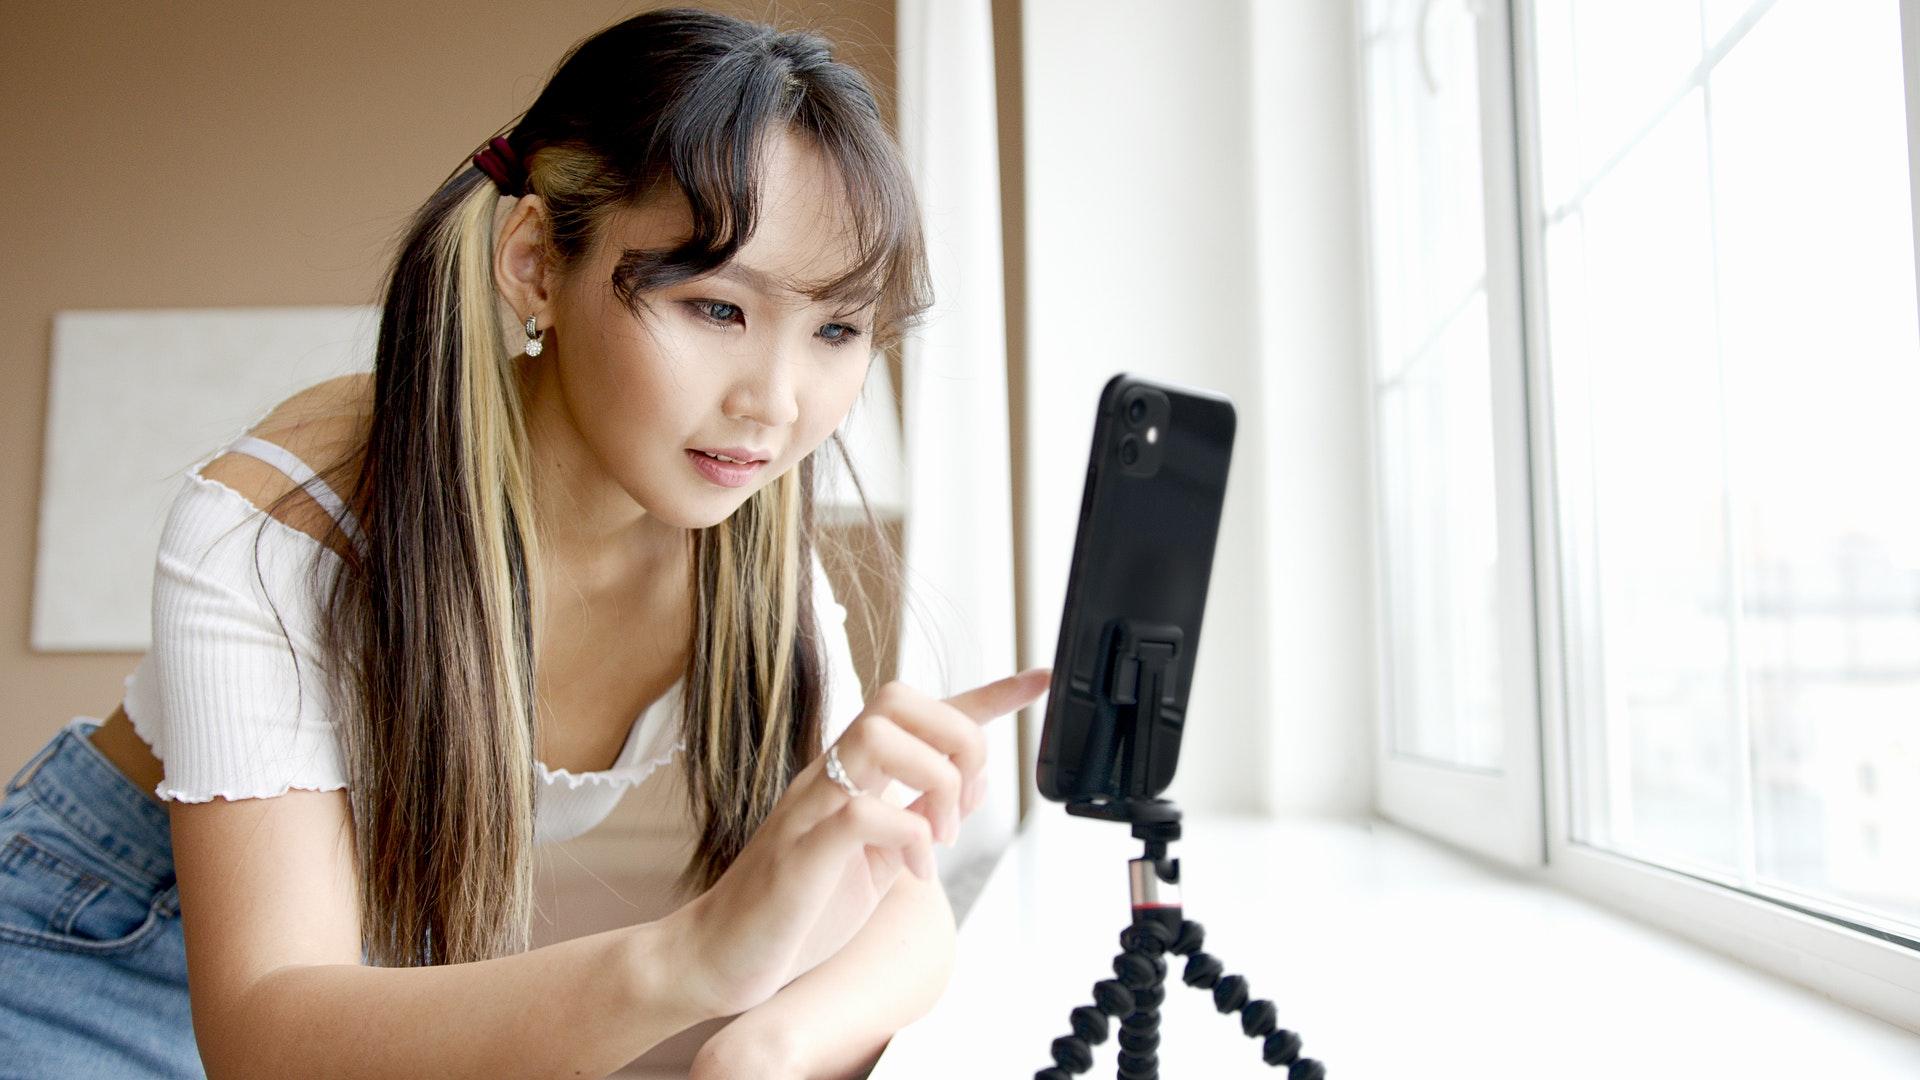 Girl using phone on tripod